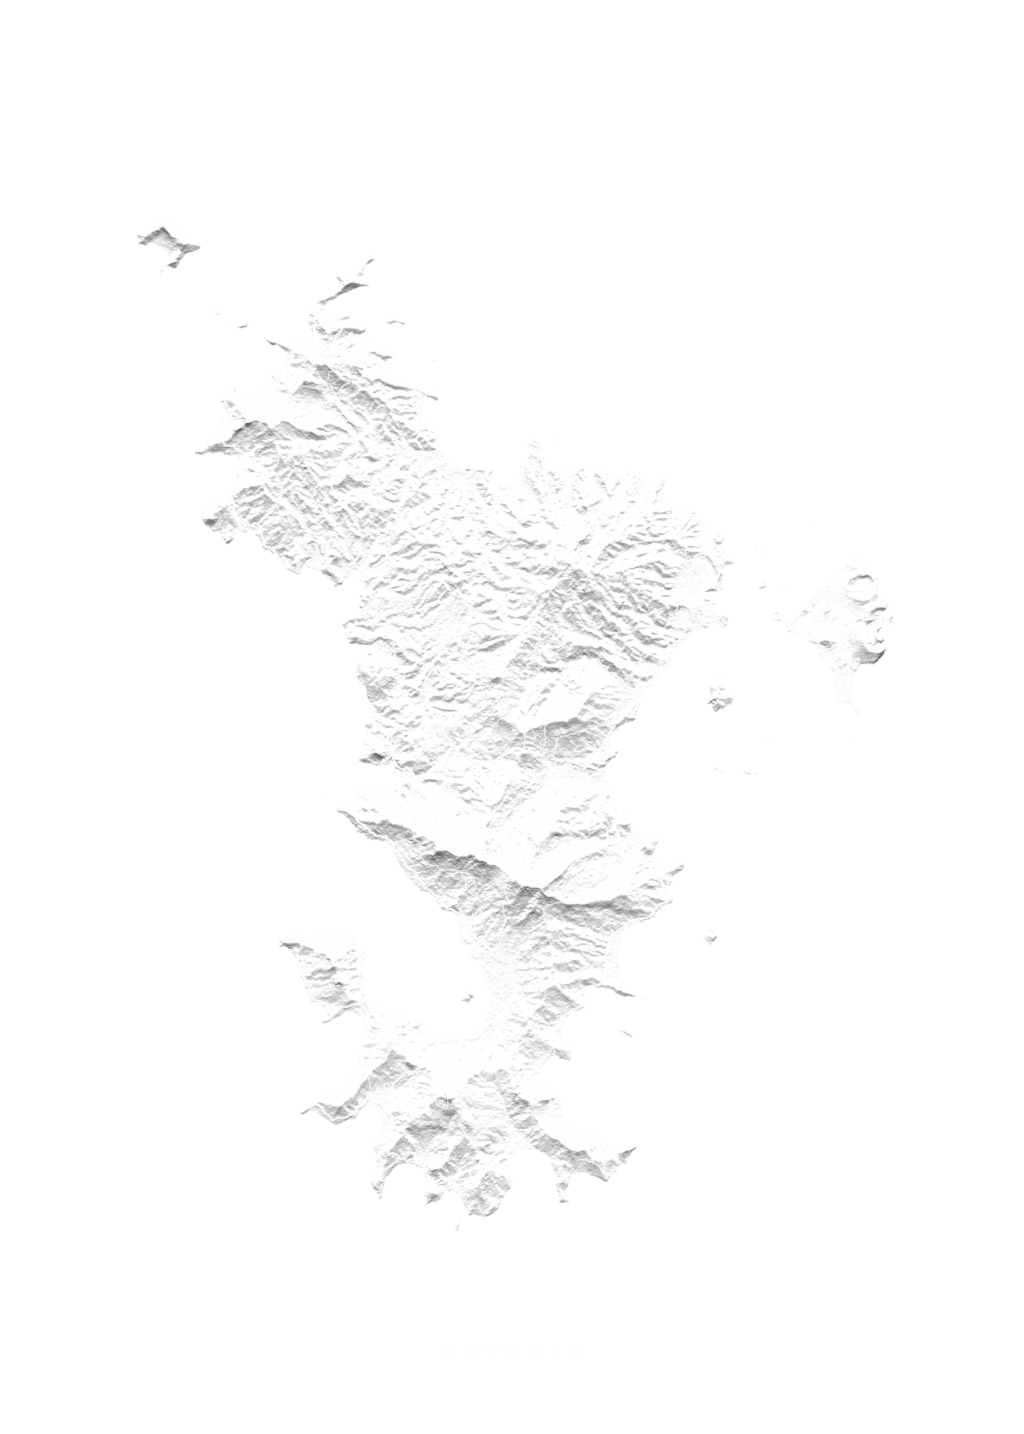 Mayotte wall map